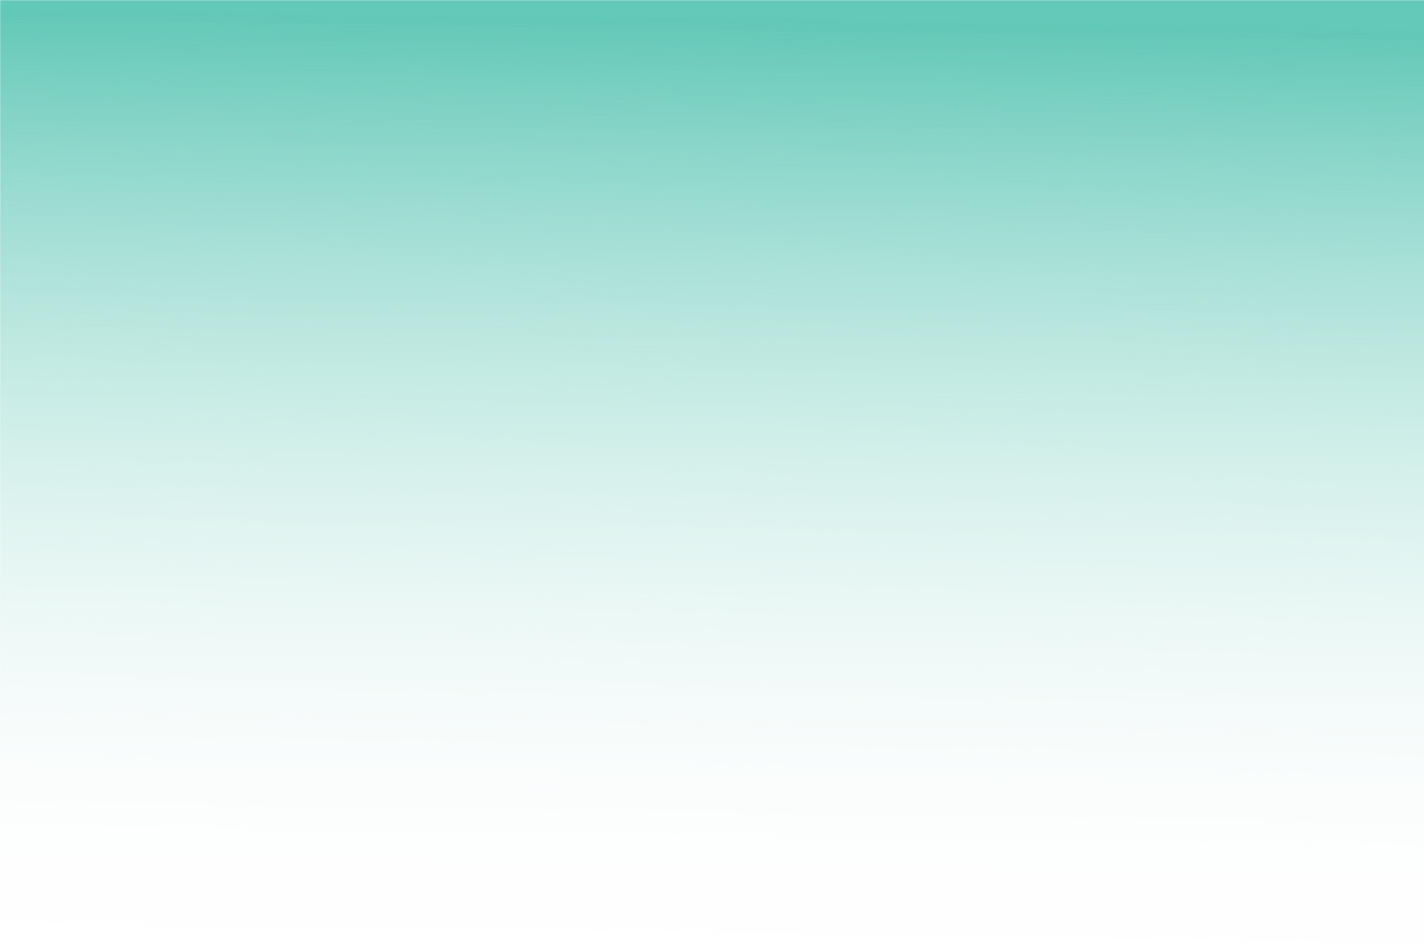 Untitled-5_tealgradient-11 (1).png